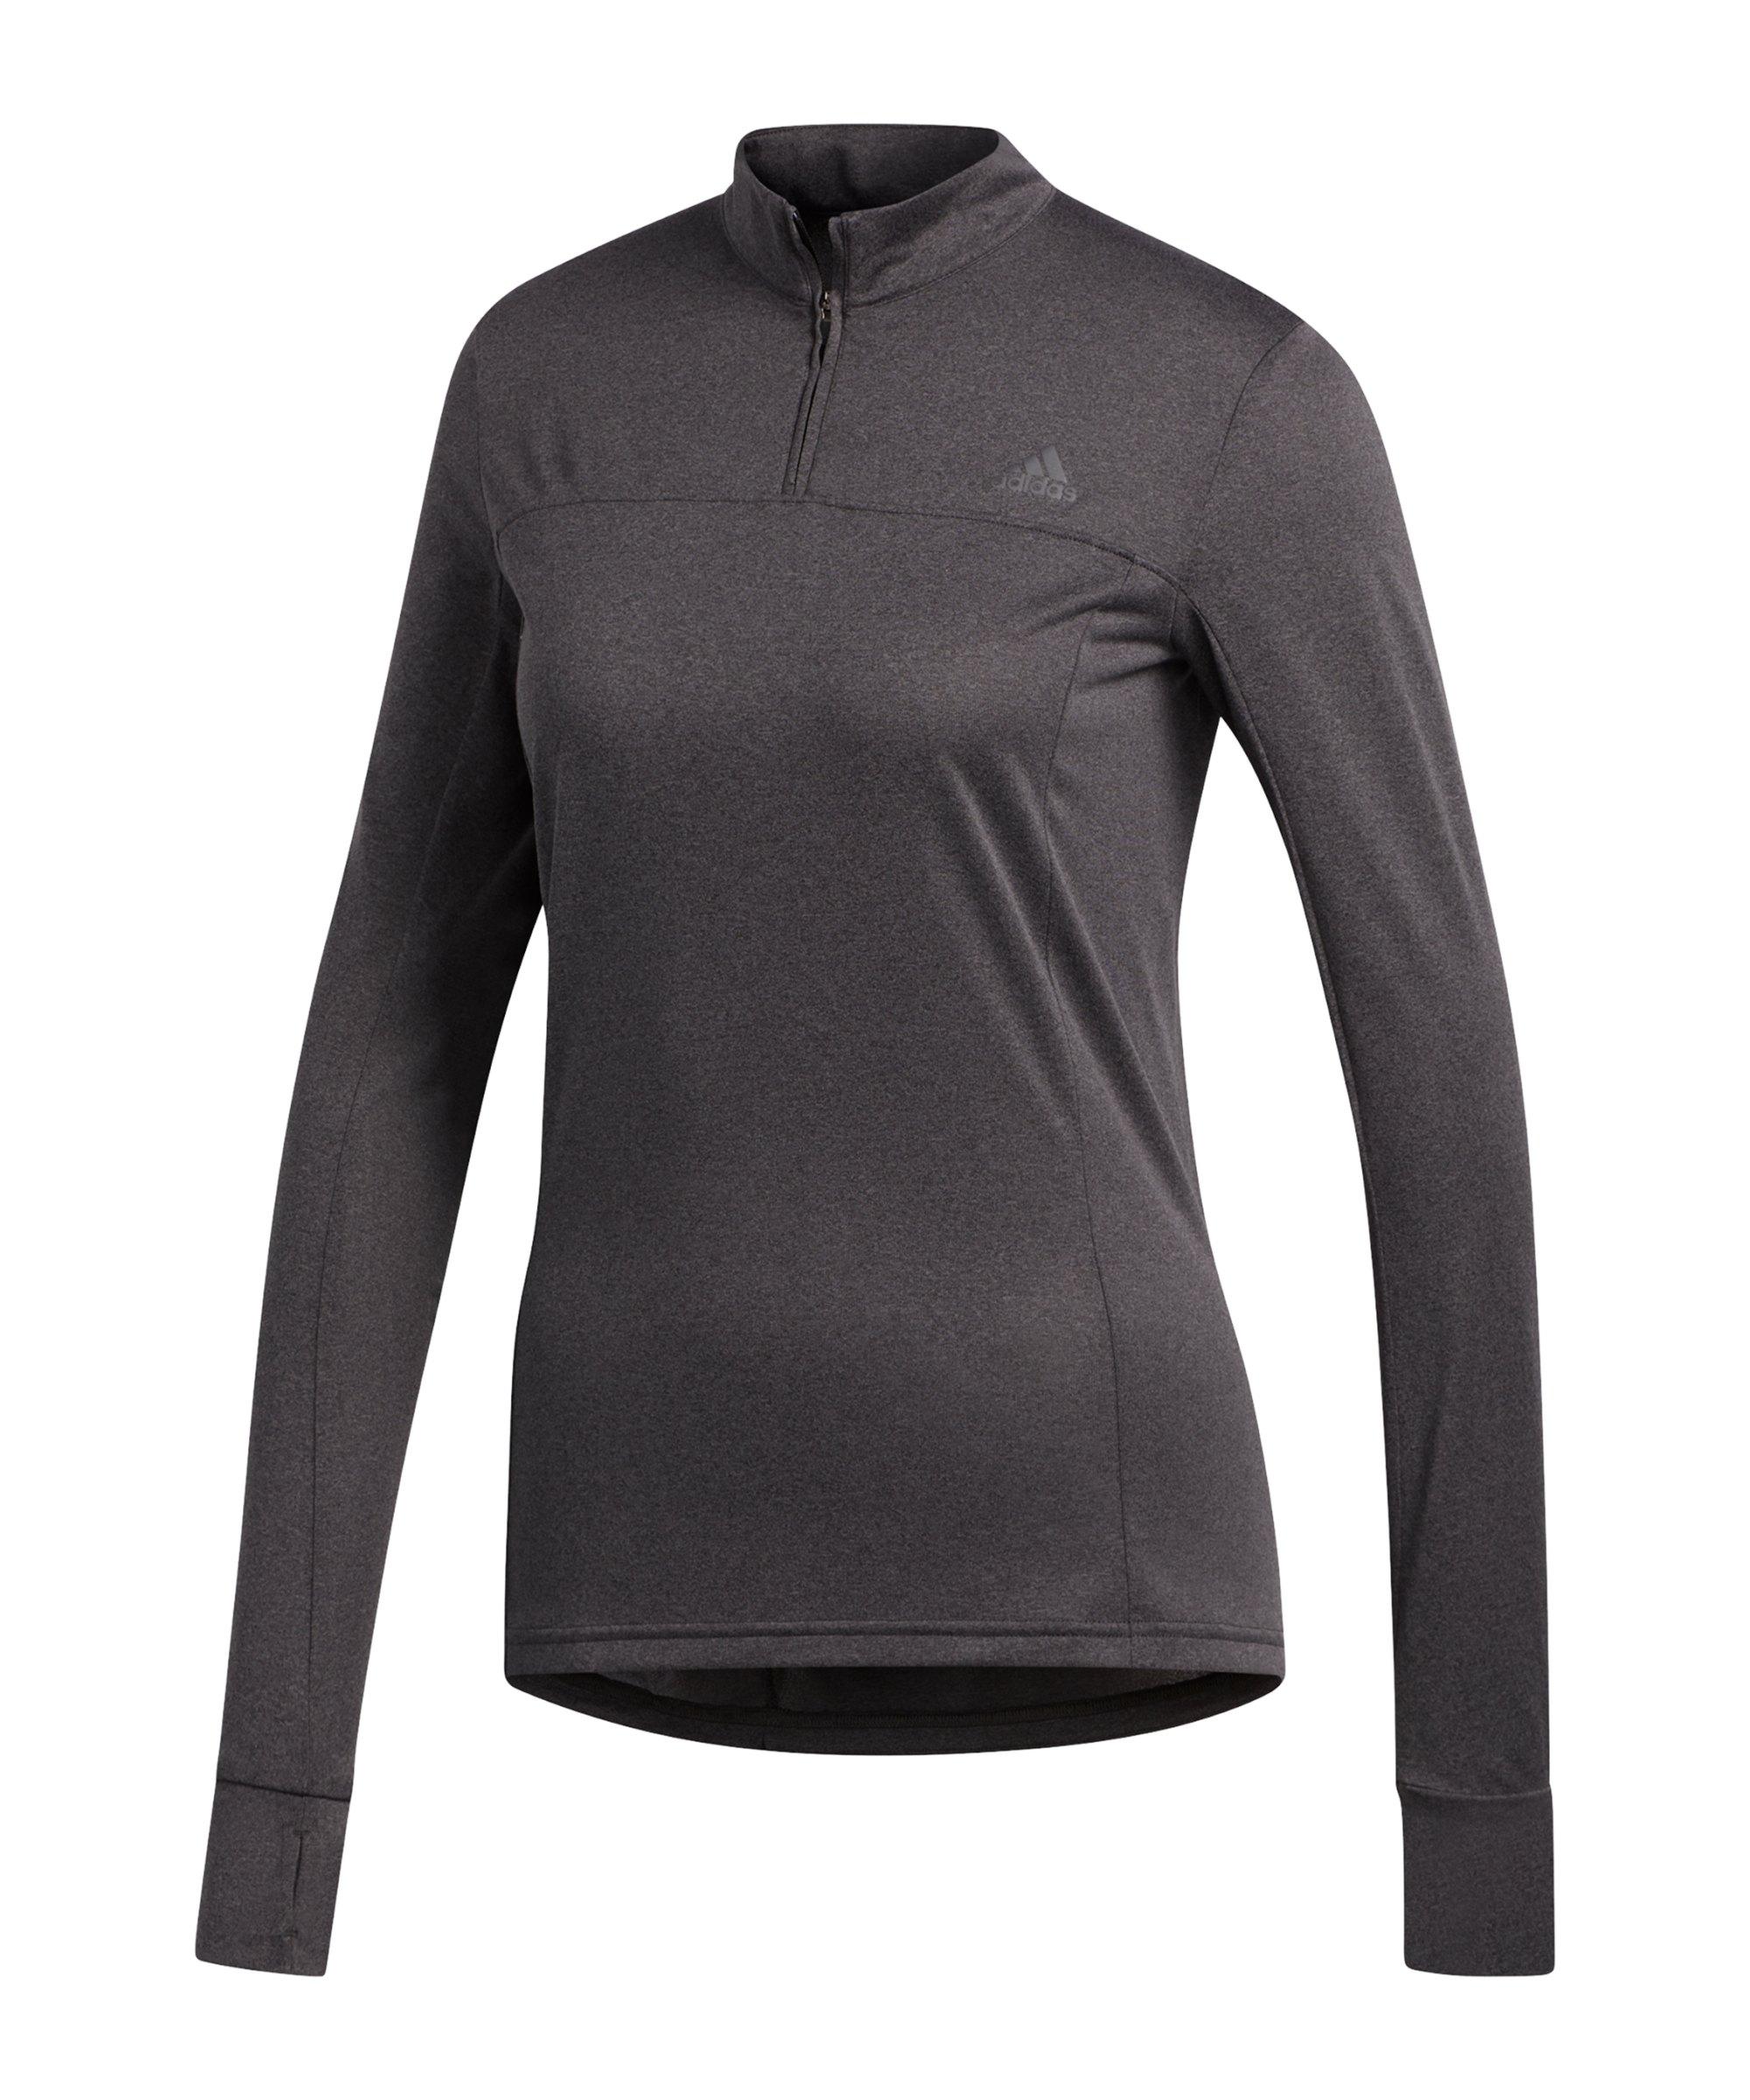 adidas OtR 1/2 Zip Shirt Running Damen Grau - grau